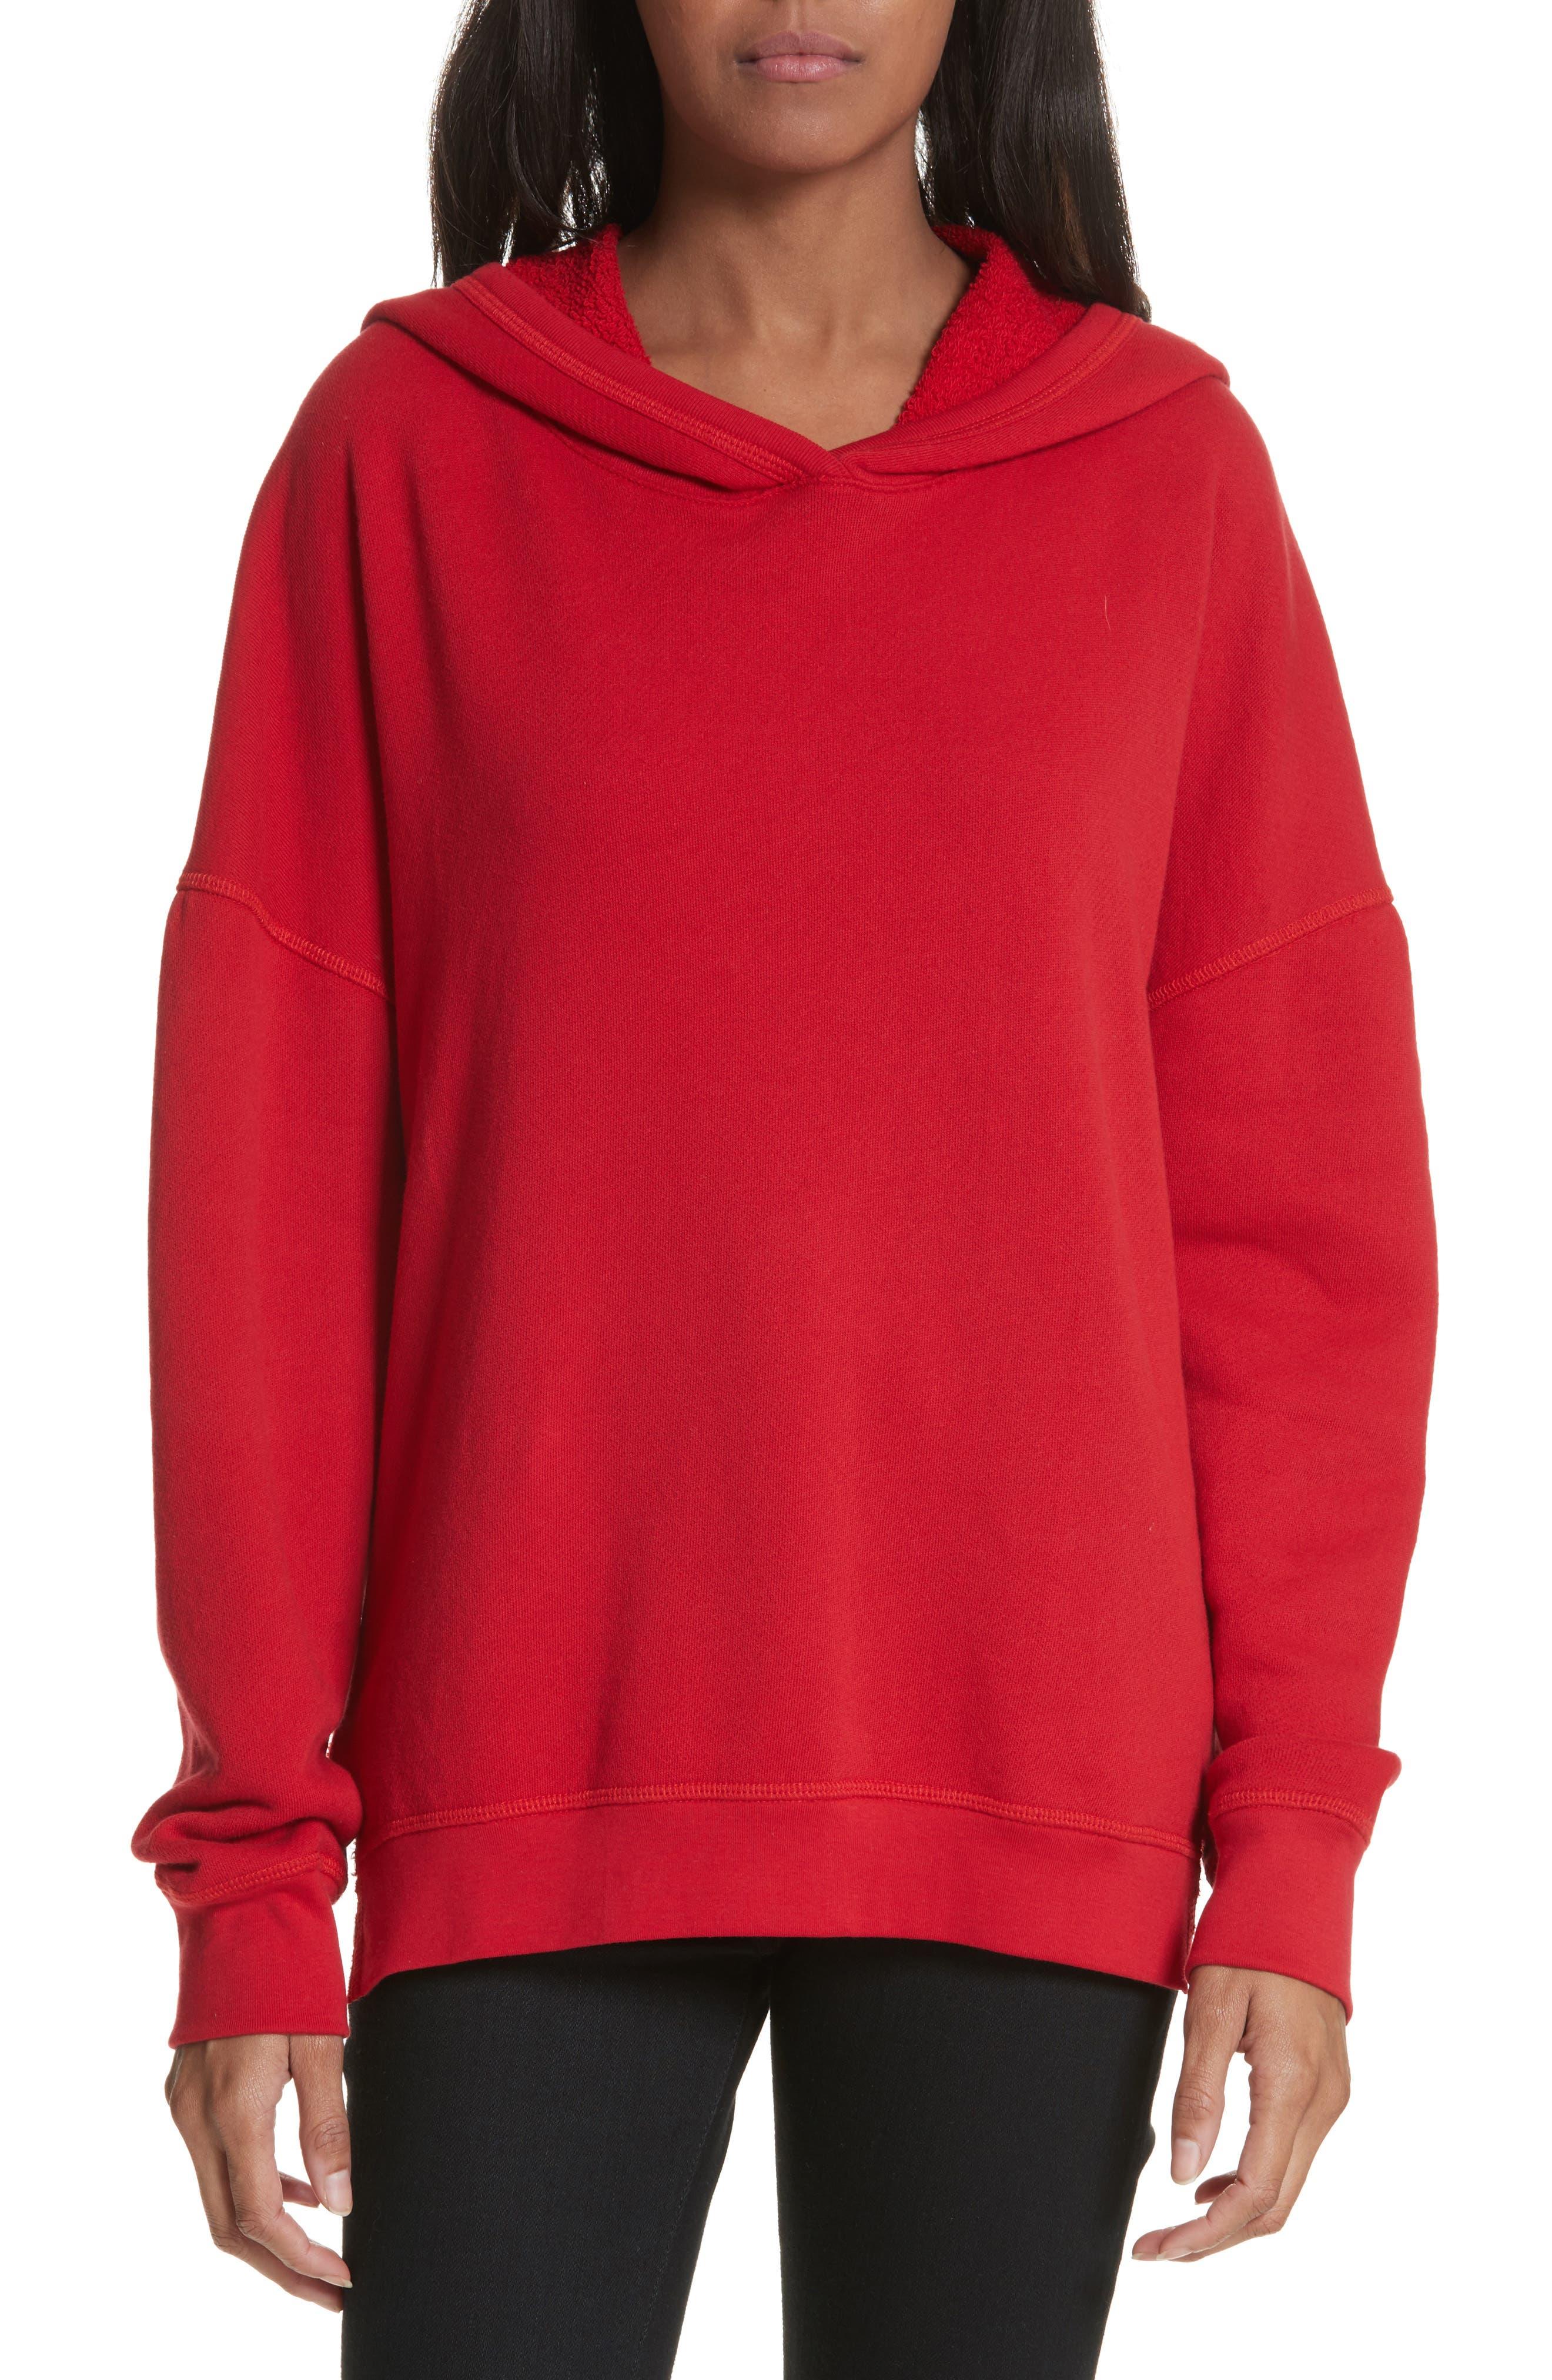 Adene Hooded Sweatshirt,                             Main thumbnail 1, color,                             Matador Red